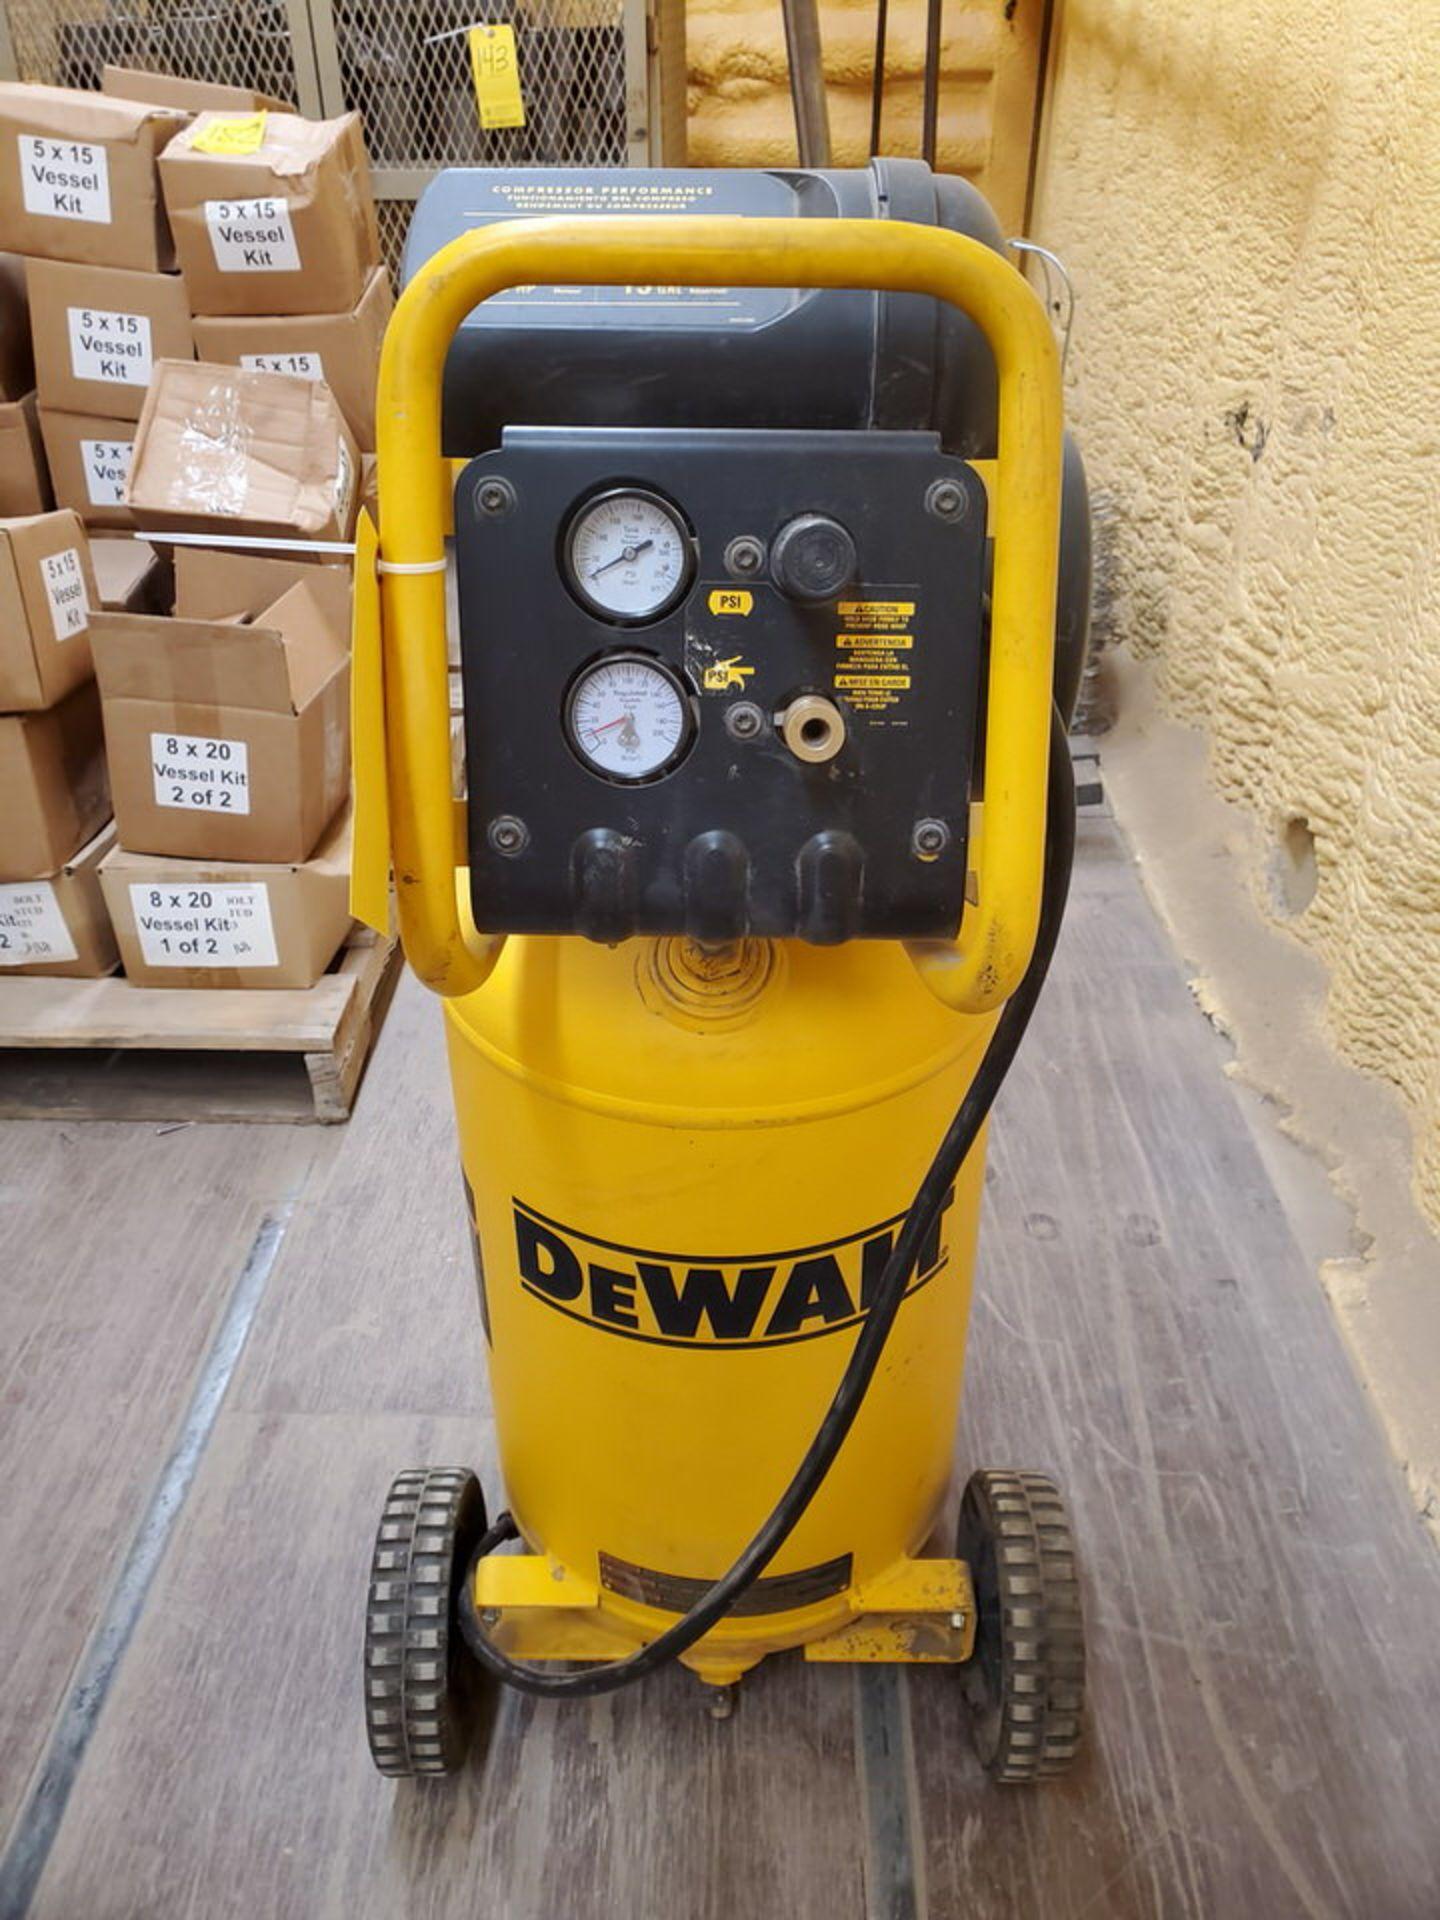 Dewalt Air Compressor 225psi, 1.6HP, 15Gal, 5.0 SCFM - Image 4 of 6